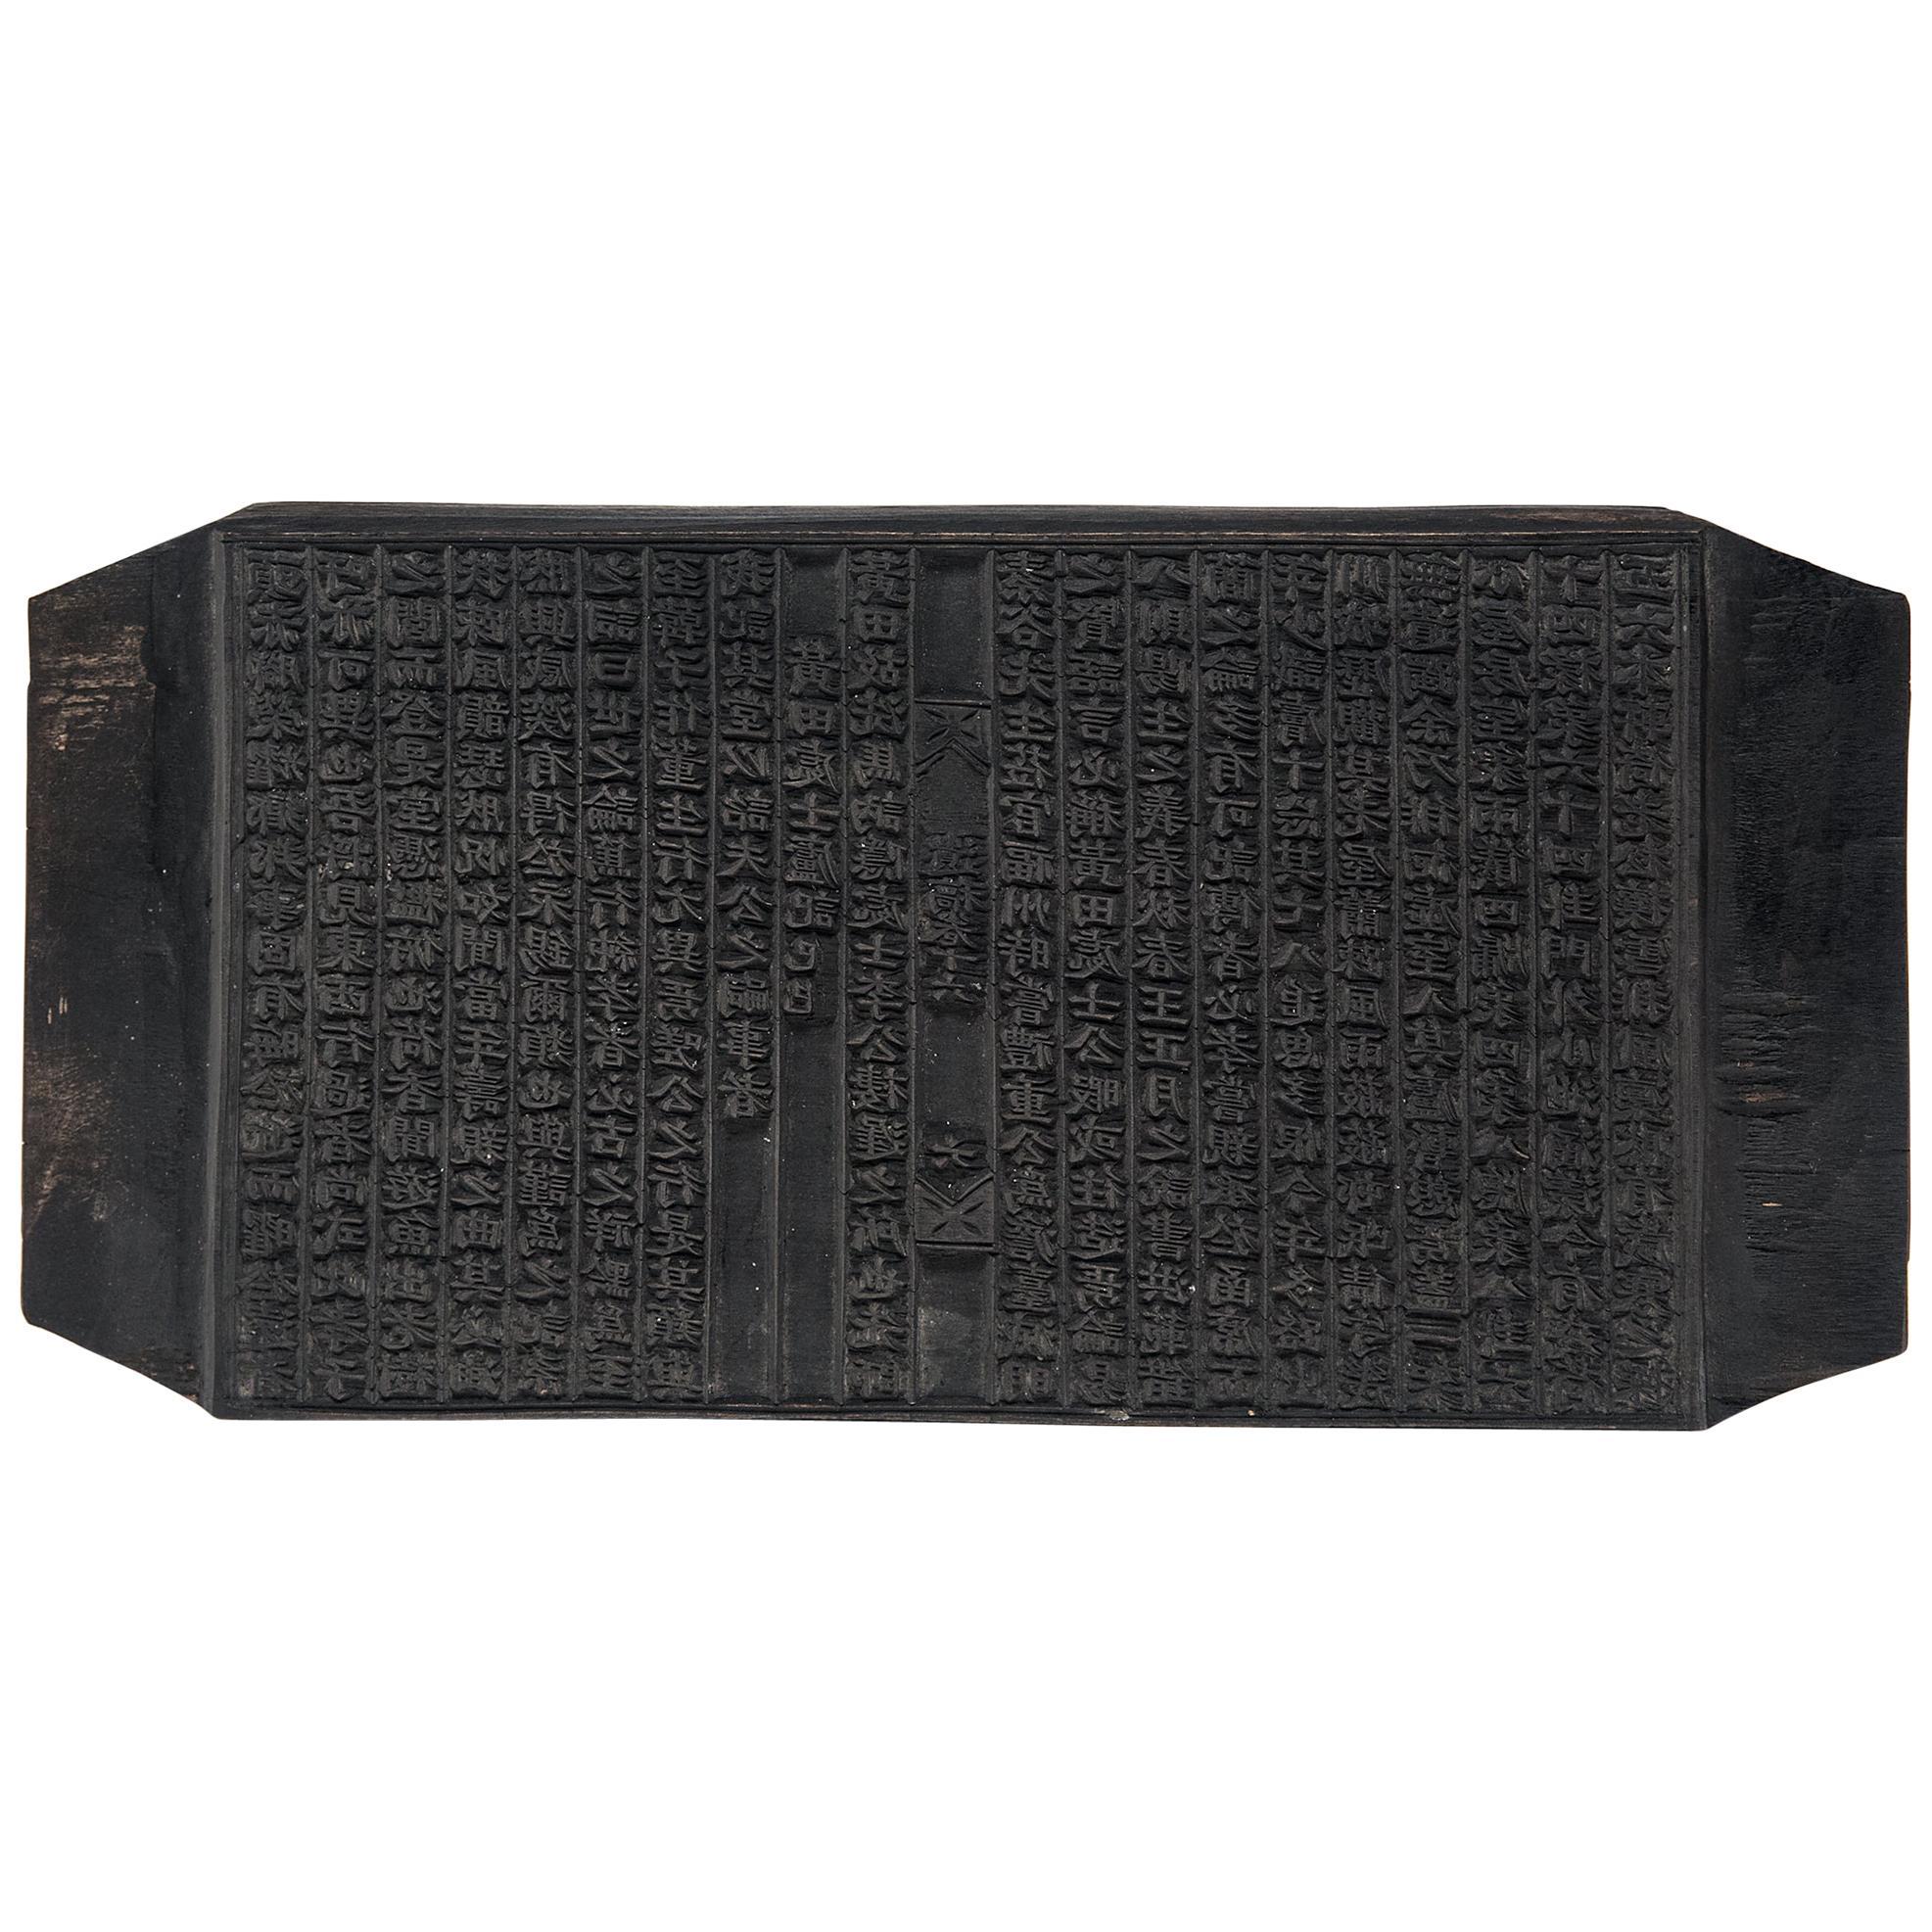 Chinese Printing Block Panel, circa 1850